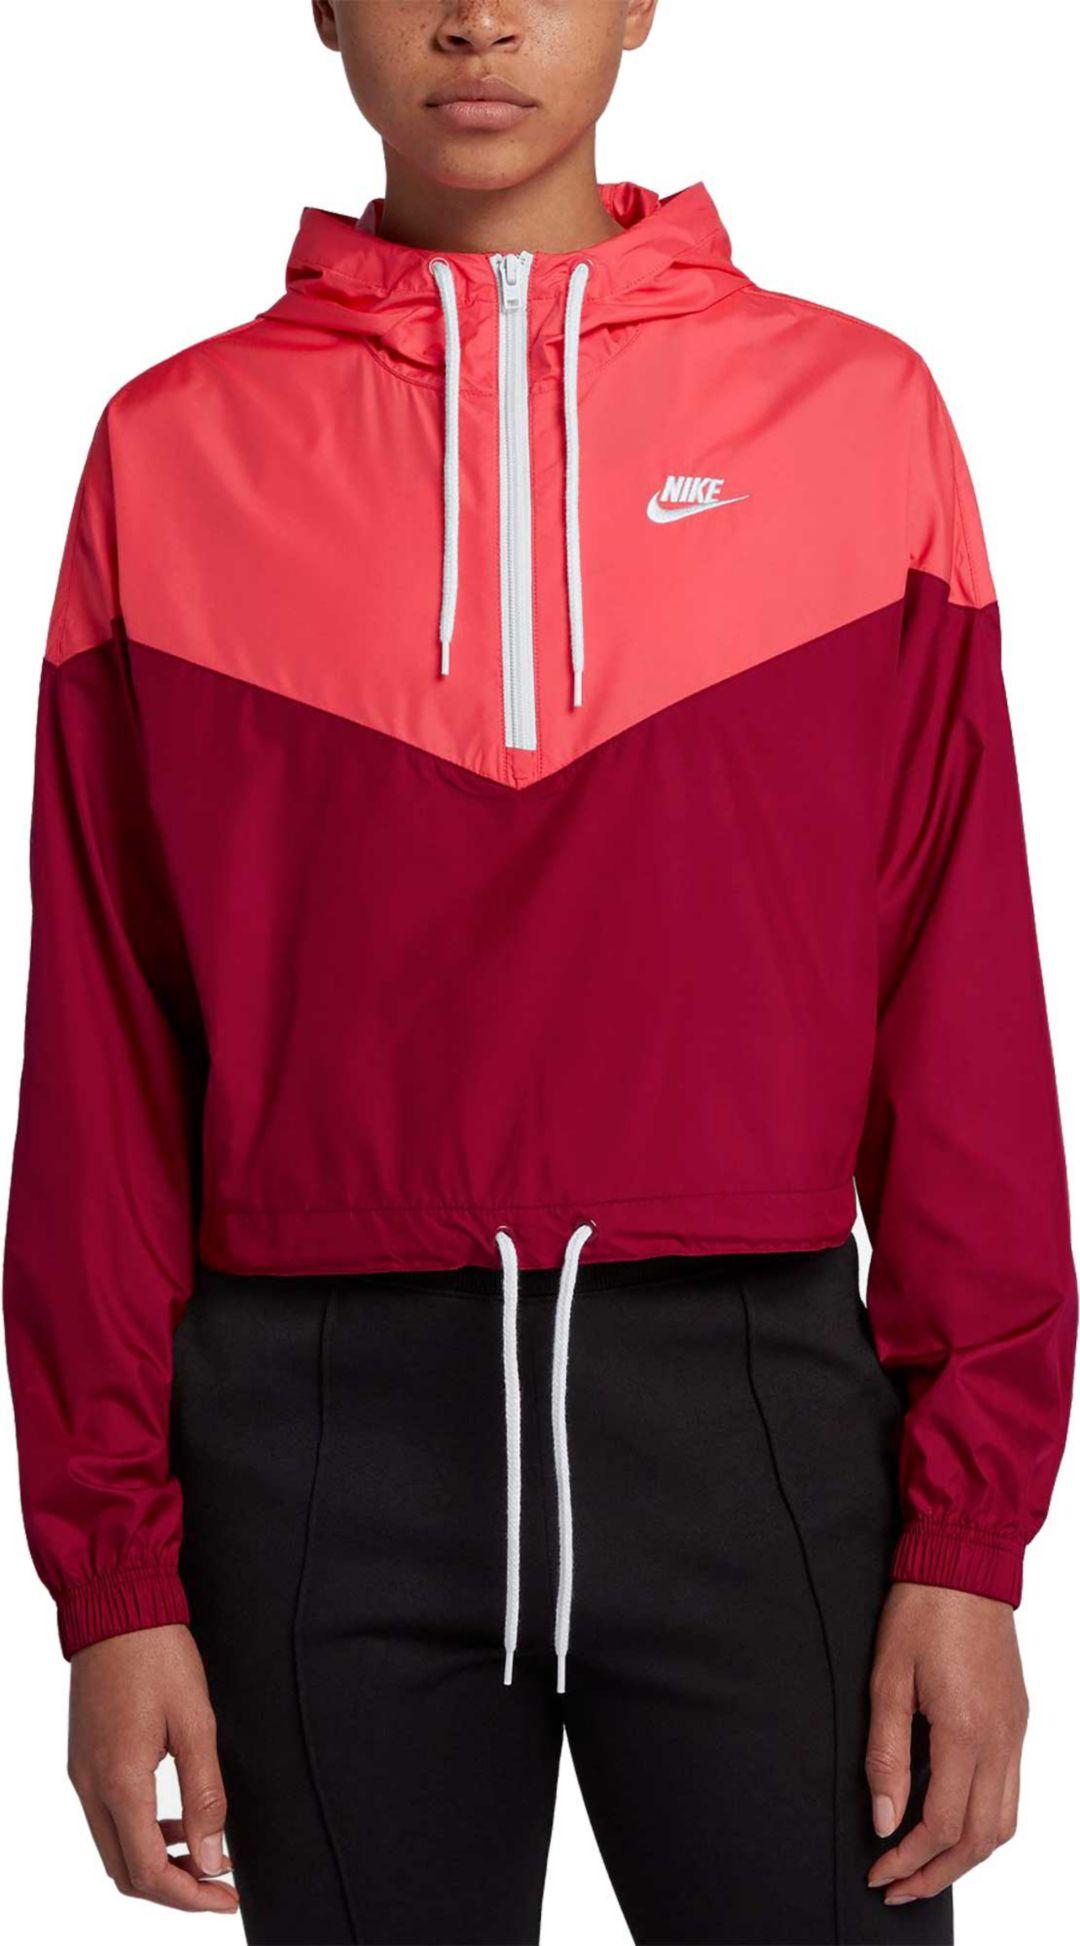 c0aba702d0a9 Nike Women's Sportswear Heritage Windrunner Jacket. noImageFound. Previous